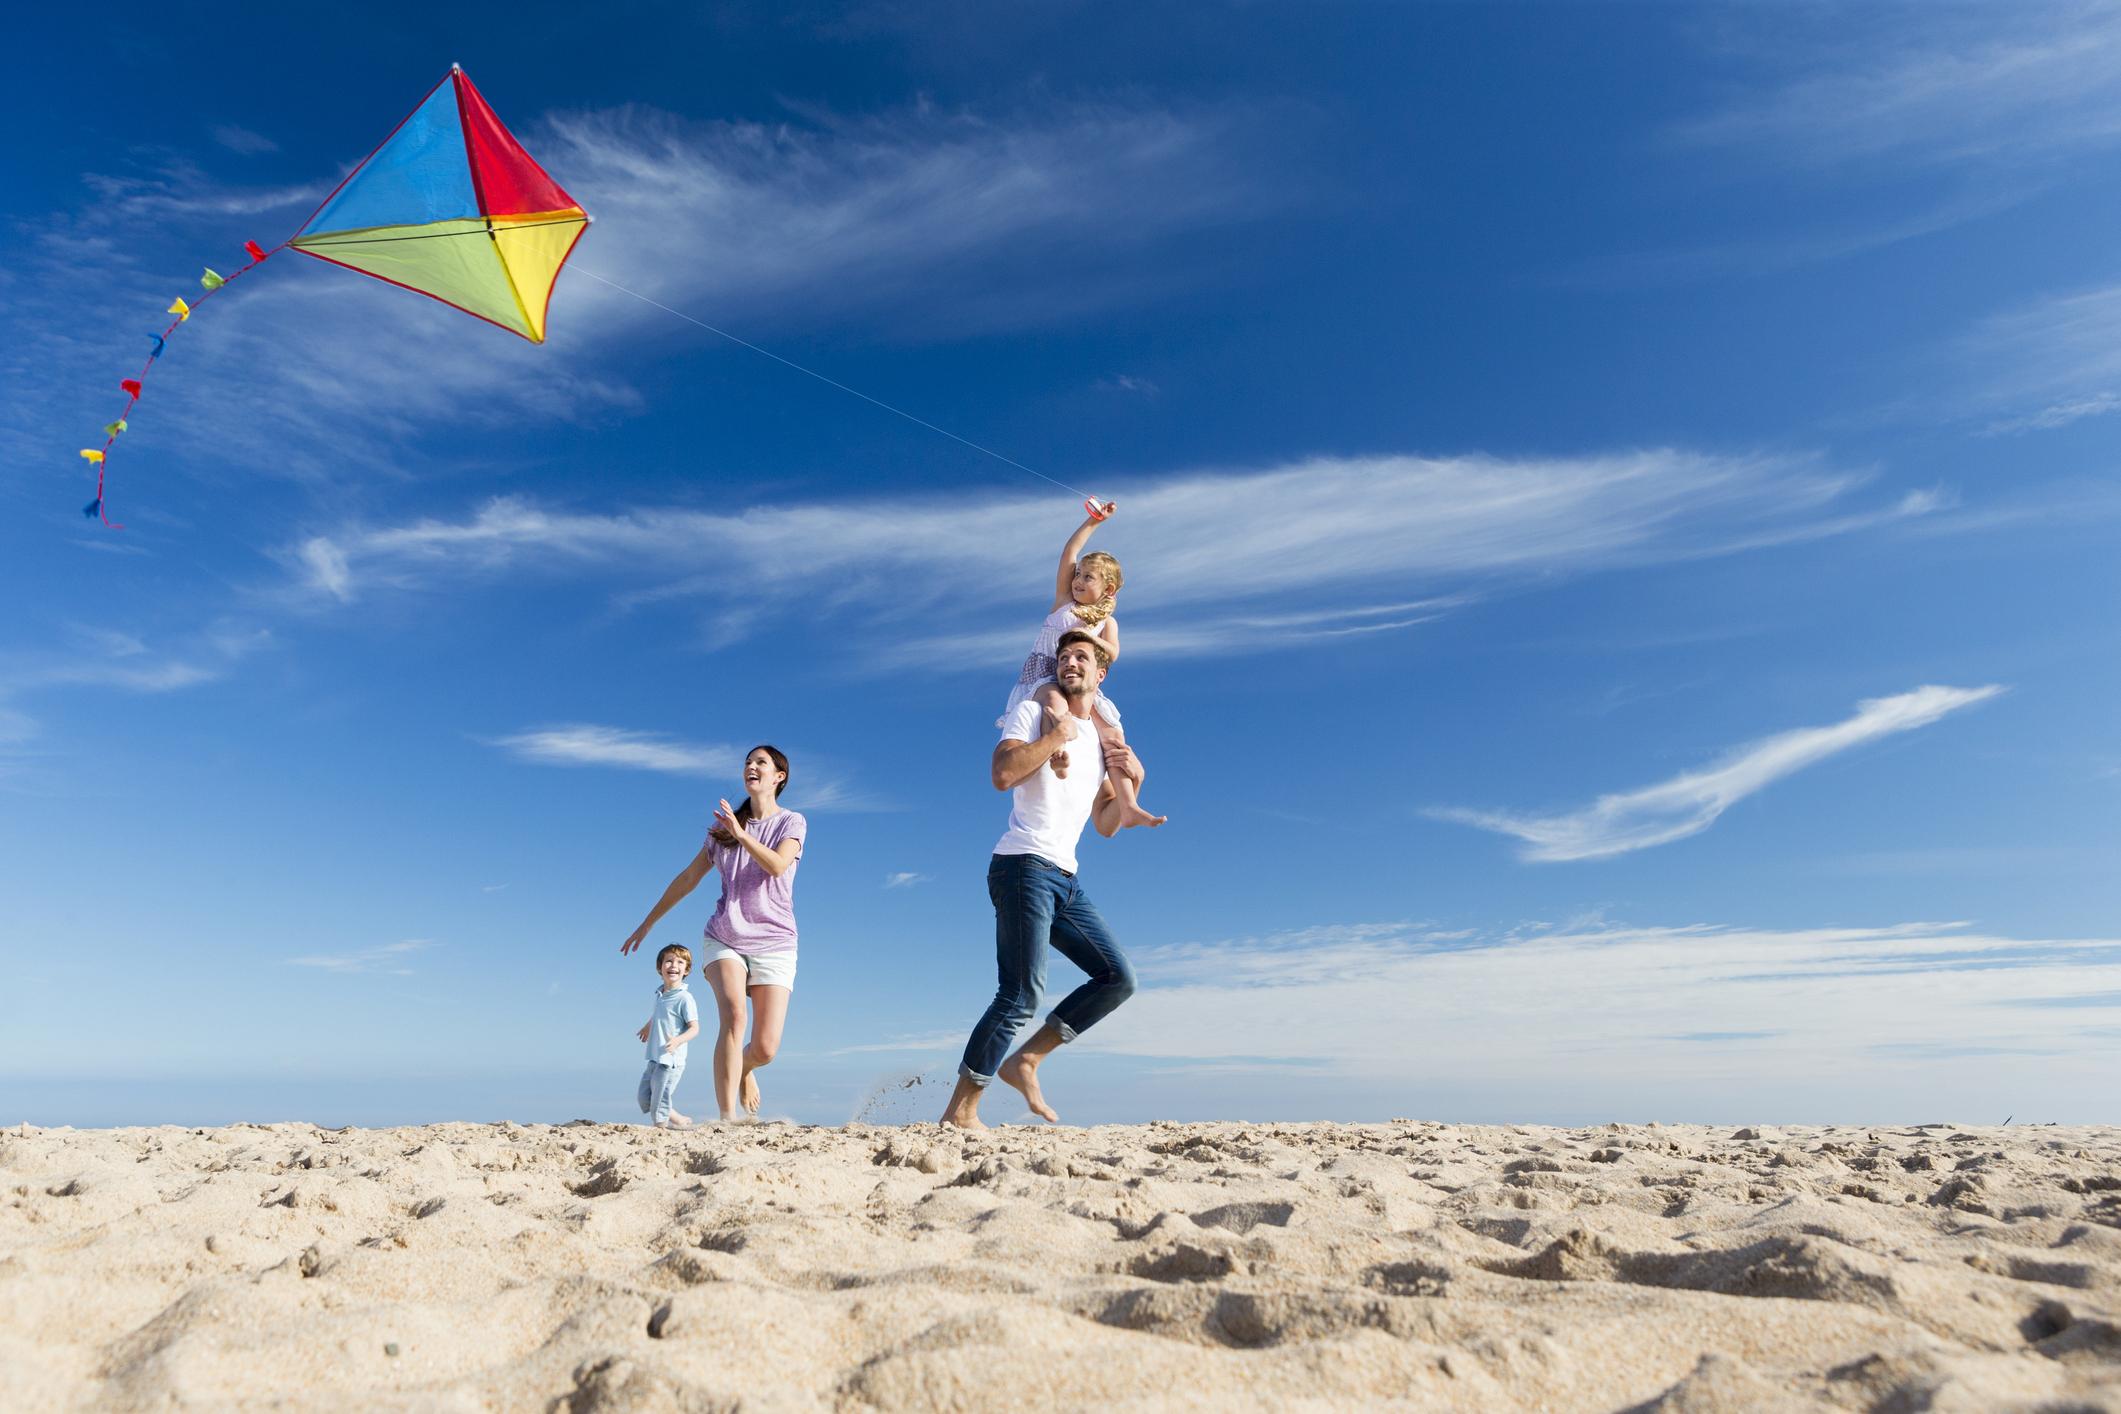 A family flies a kite on a beach.